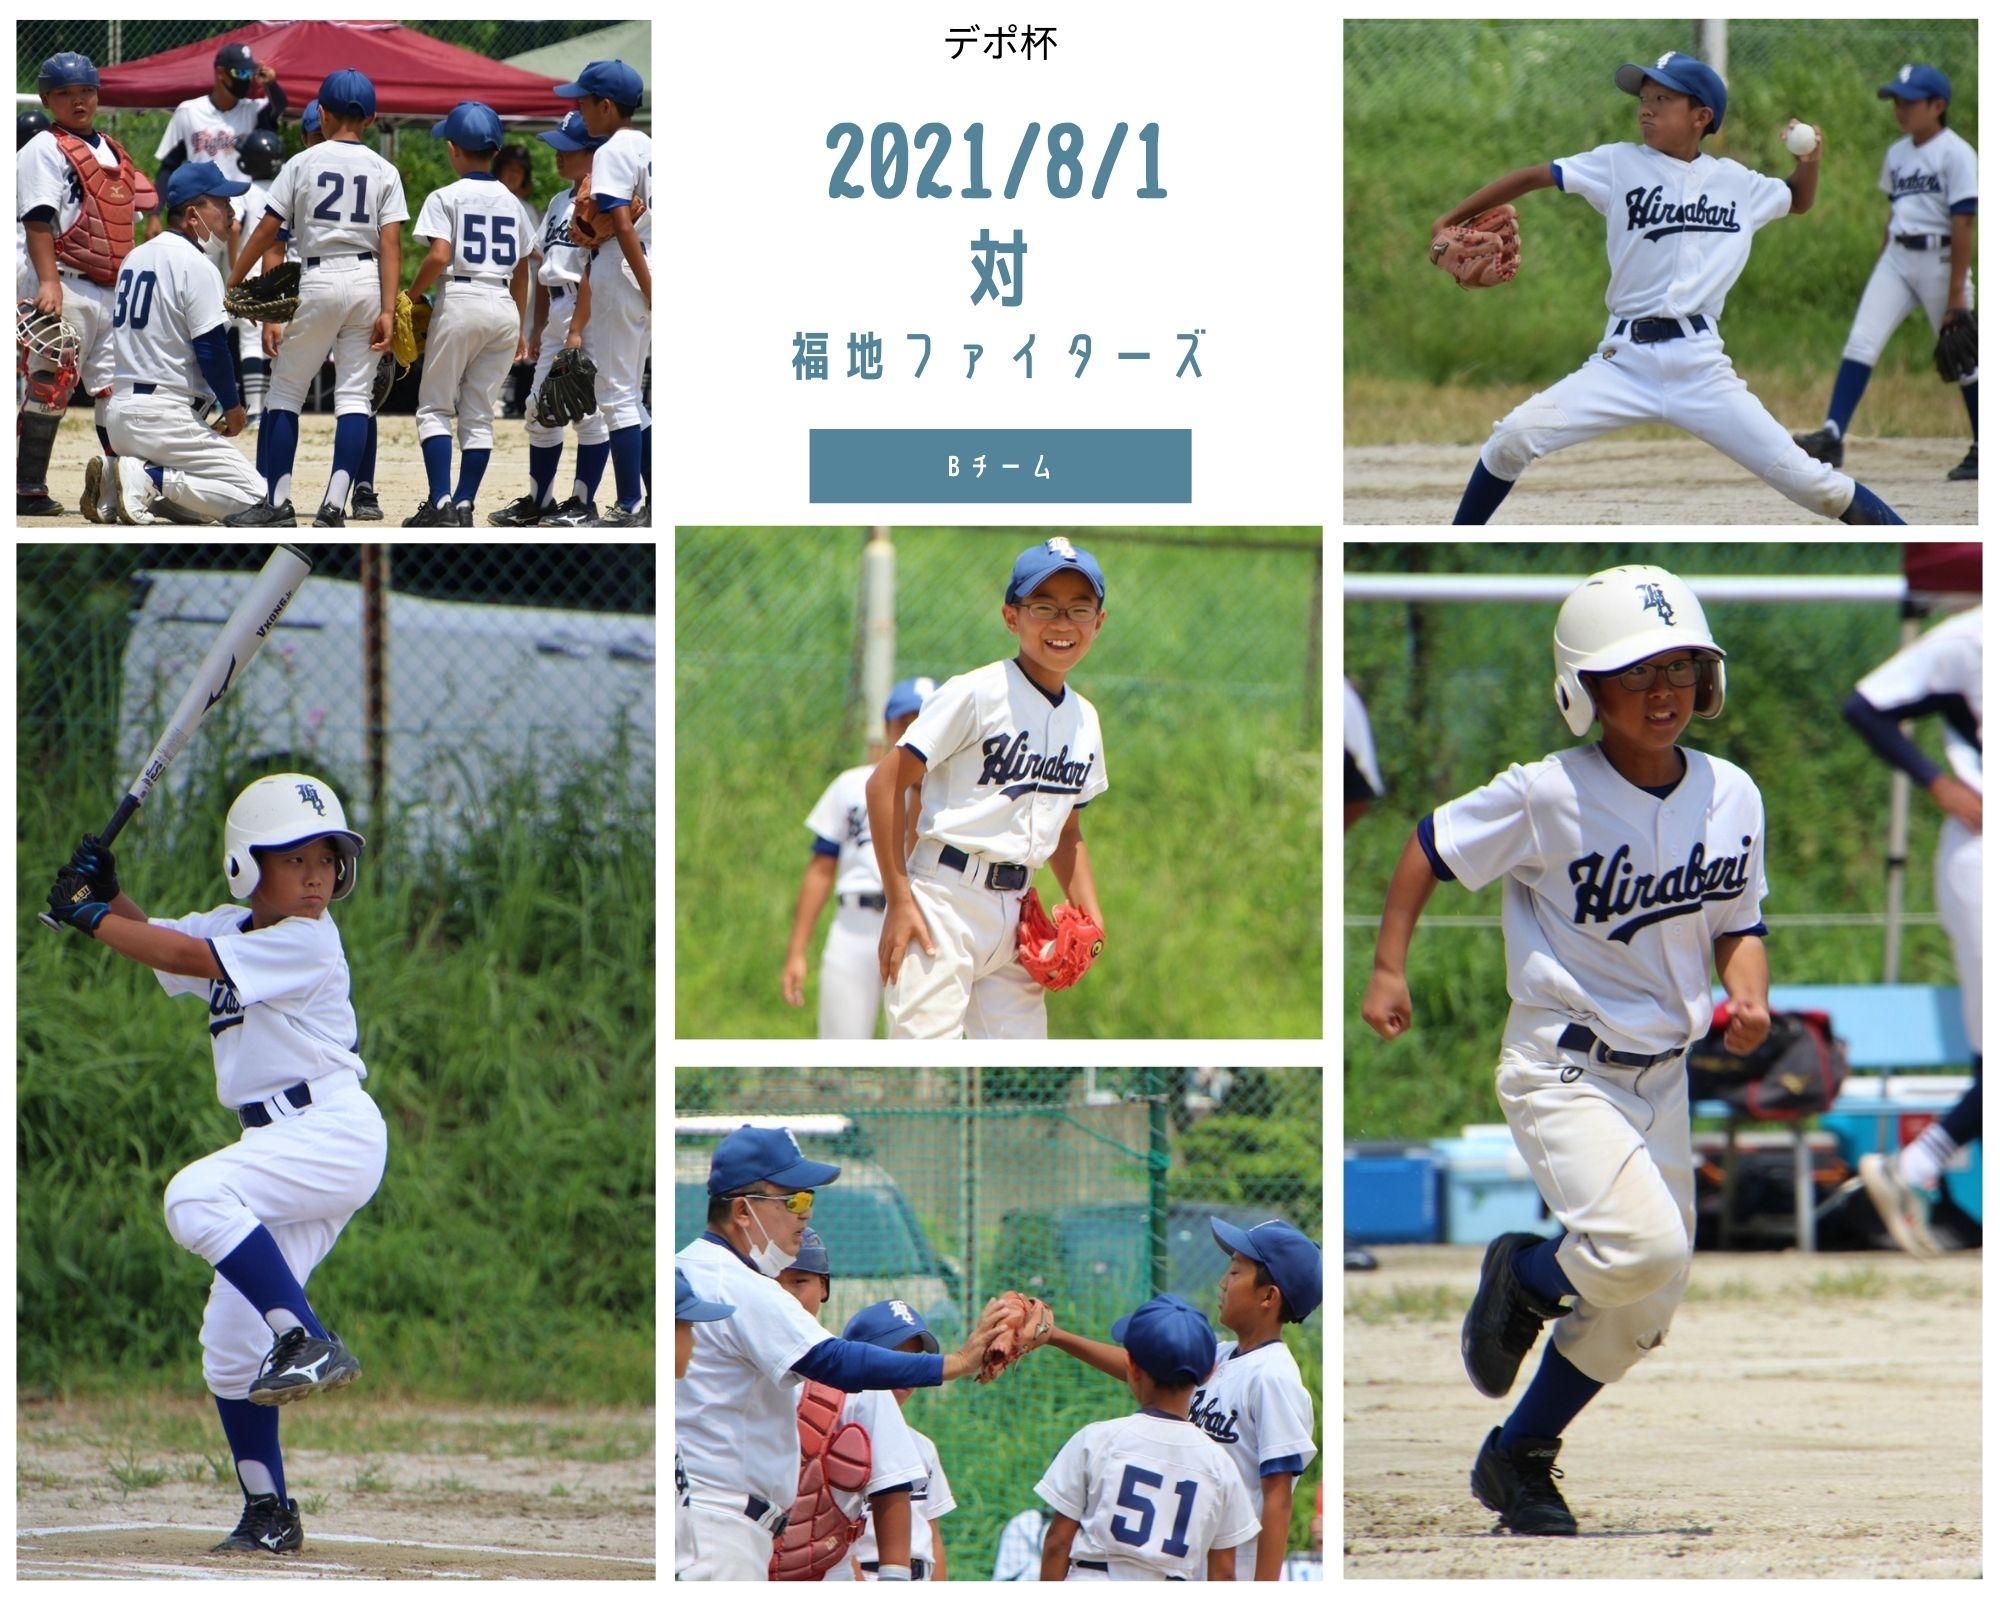 2021/8/1⚾Bチーム⚾デポ杯